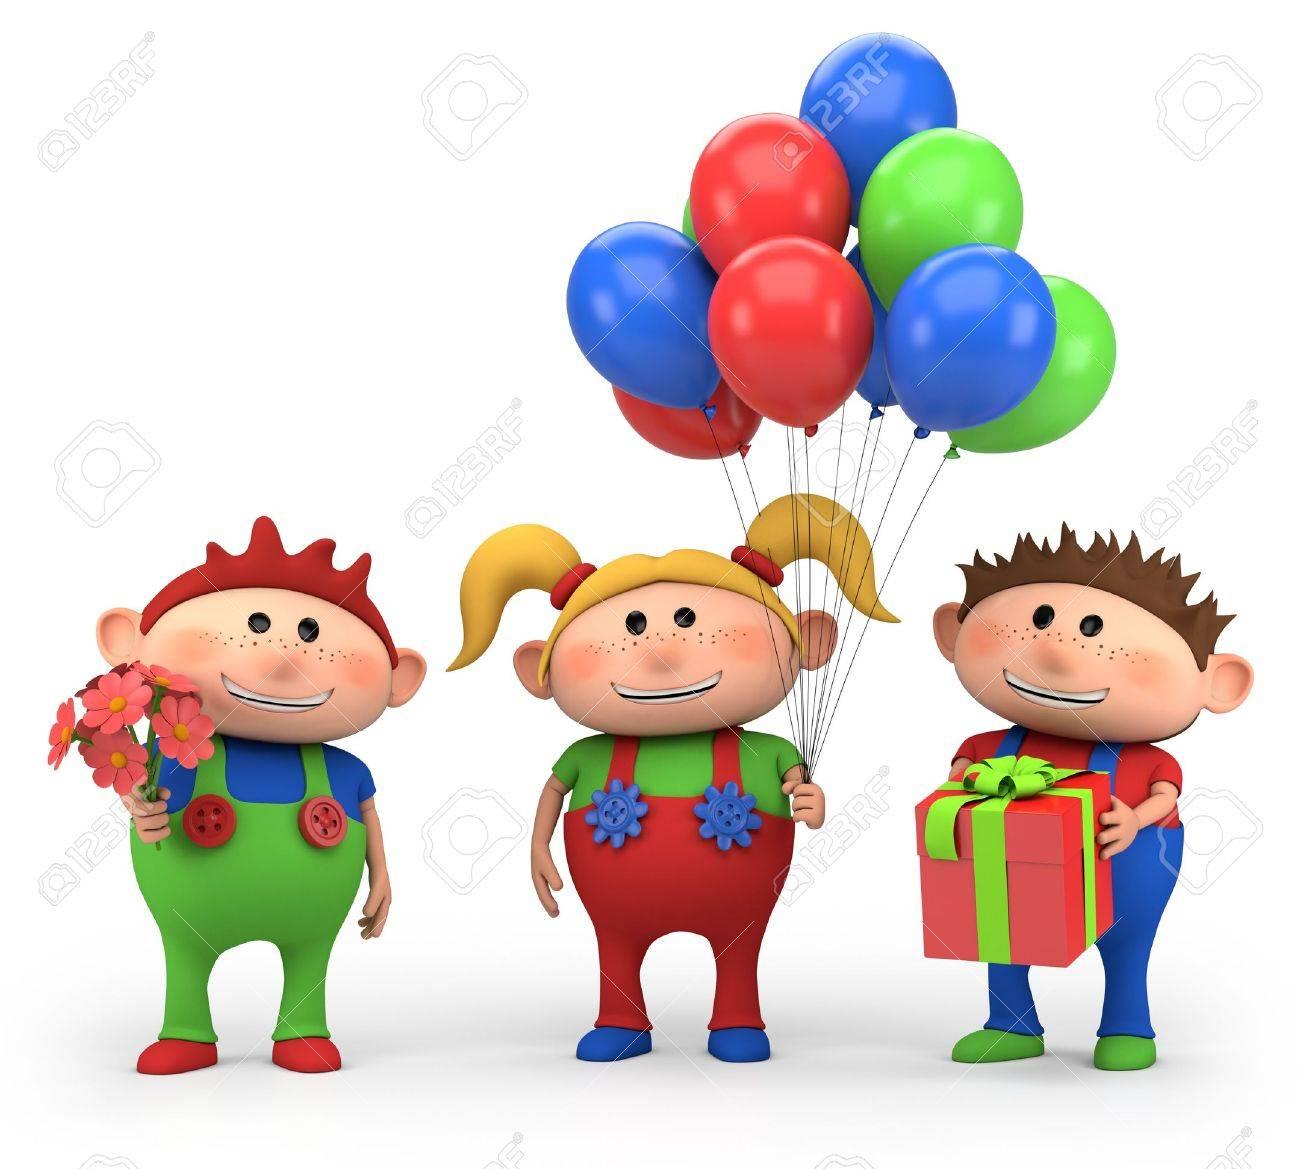 cute cartoon kids with birthday presents - high quality 3d illustration Stock Illustration - 14648323